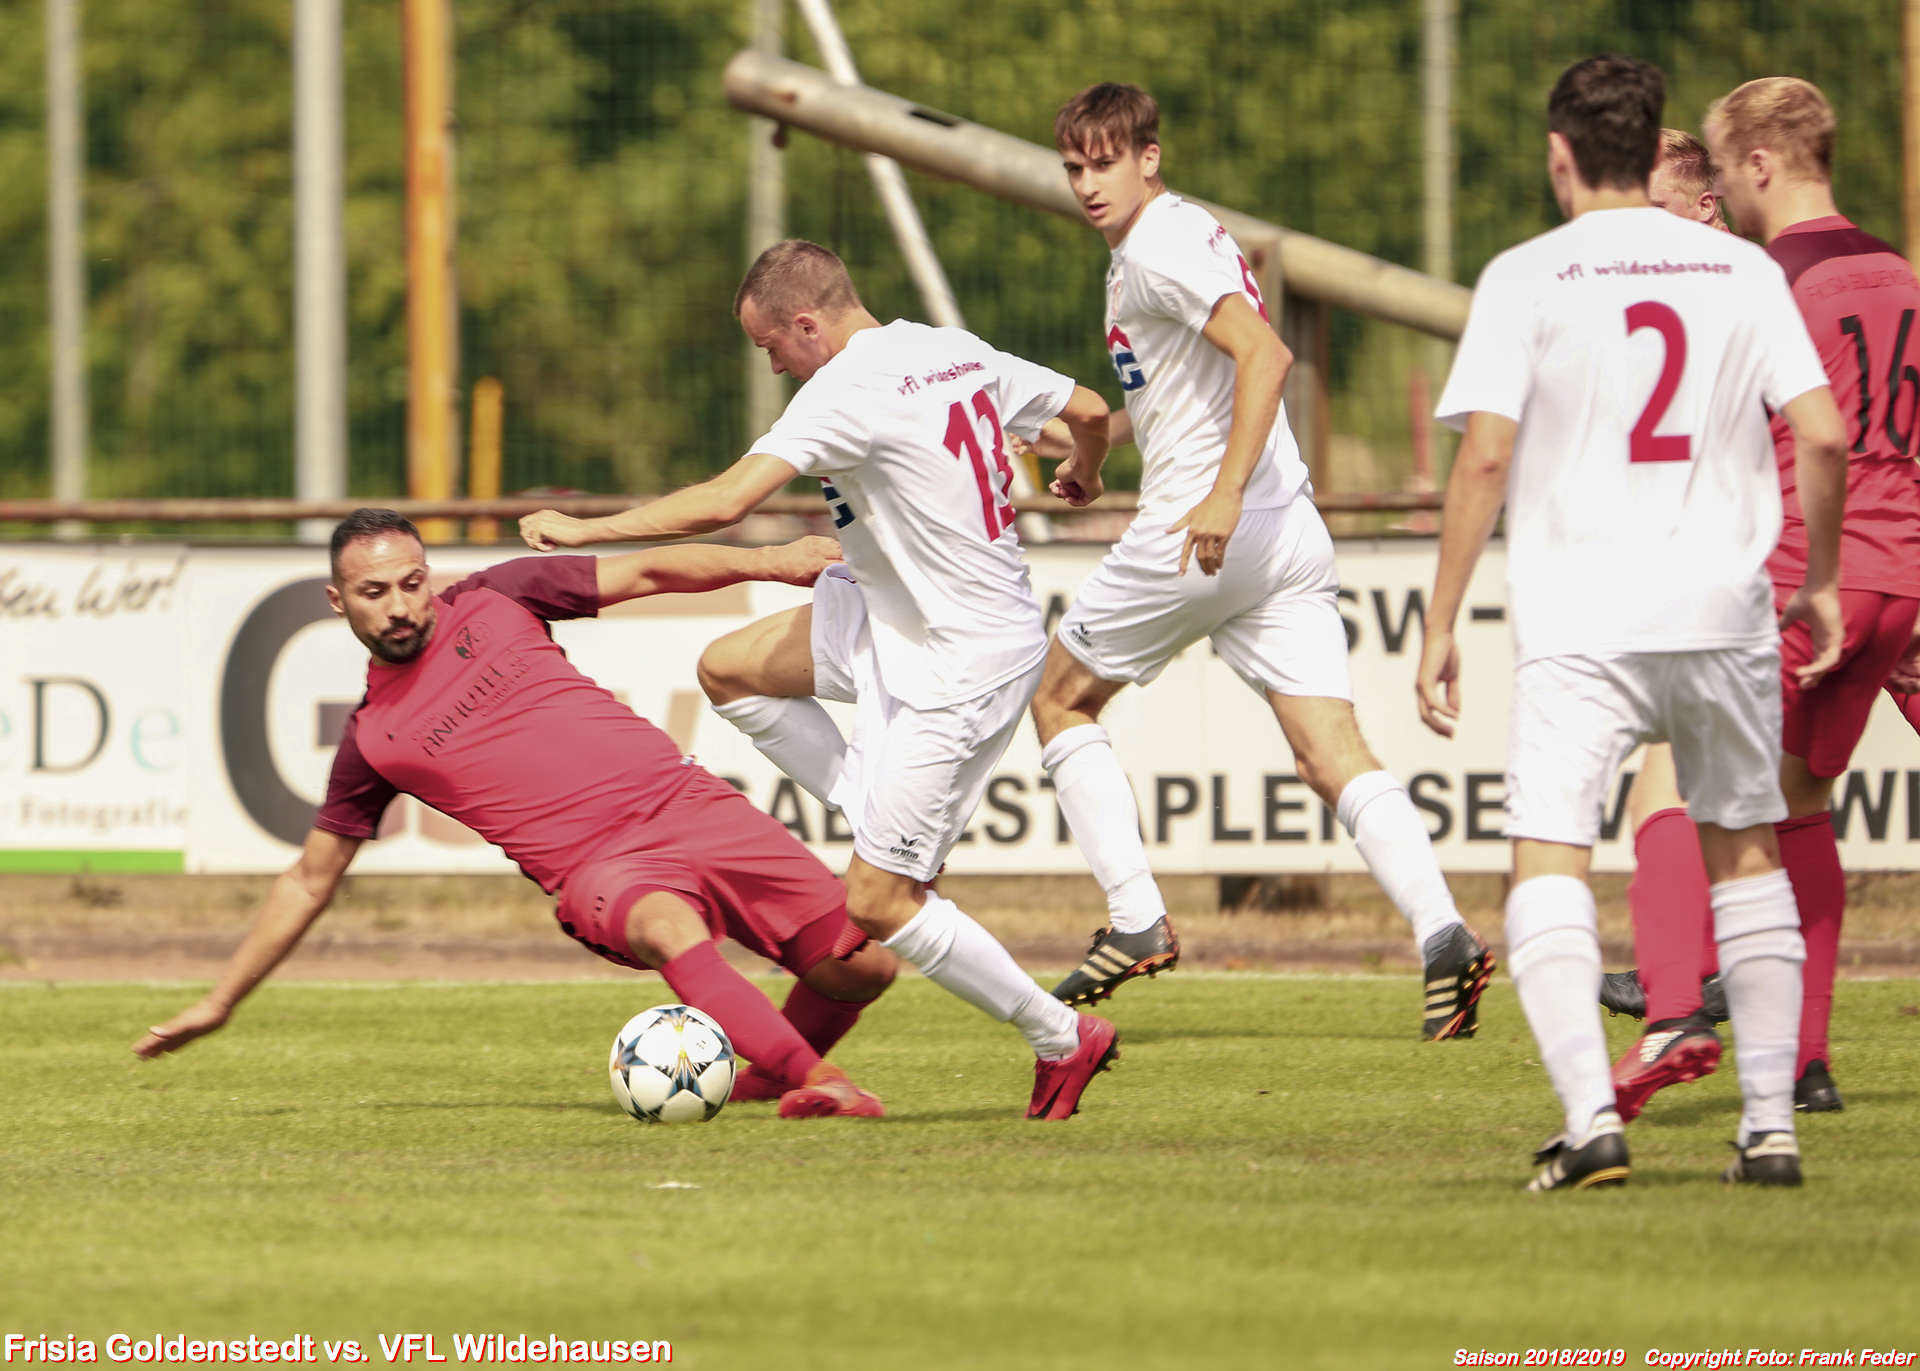 WEB_I Herren Frisia vs Wildeshausen Bezirkspokal 2018_2019 180812008.jpg